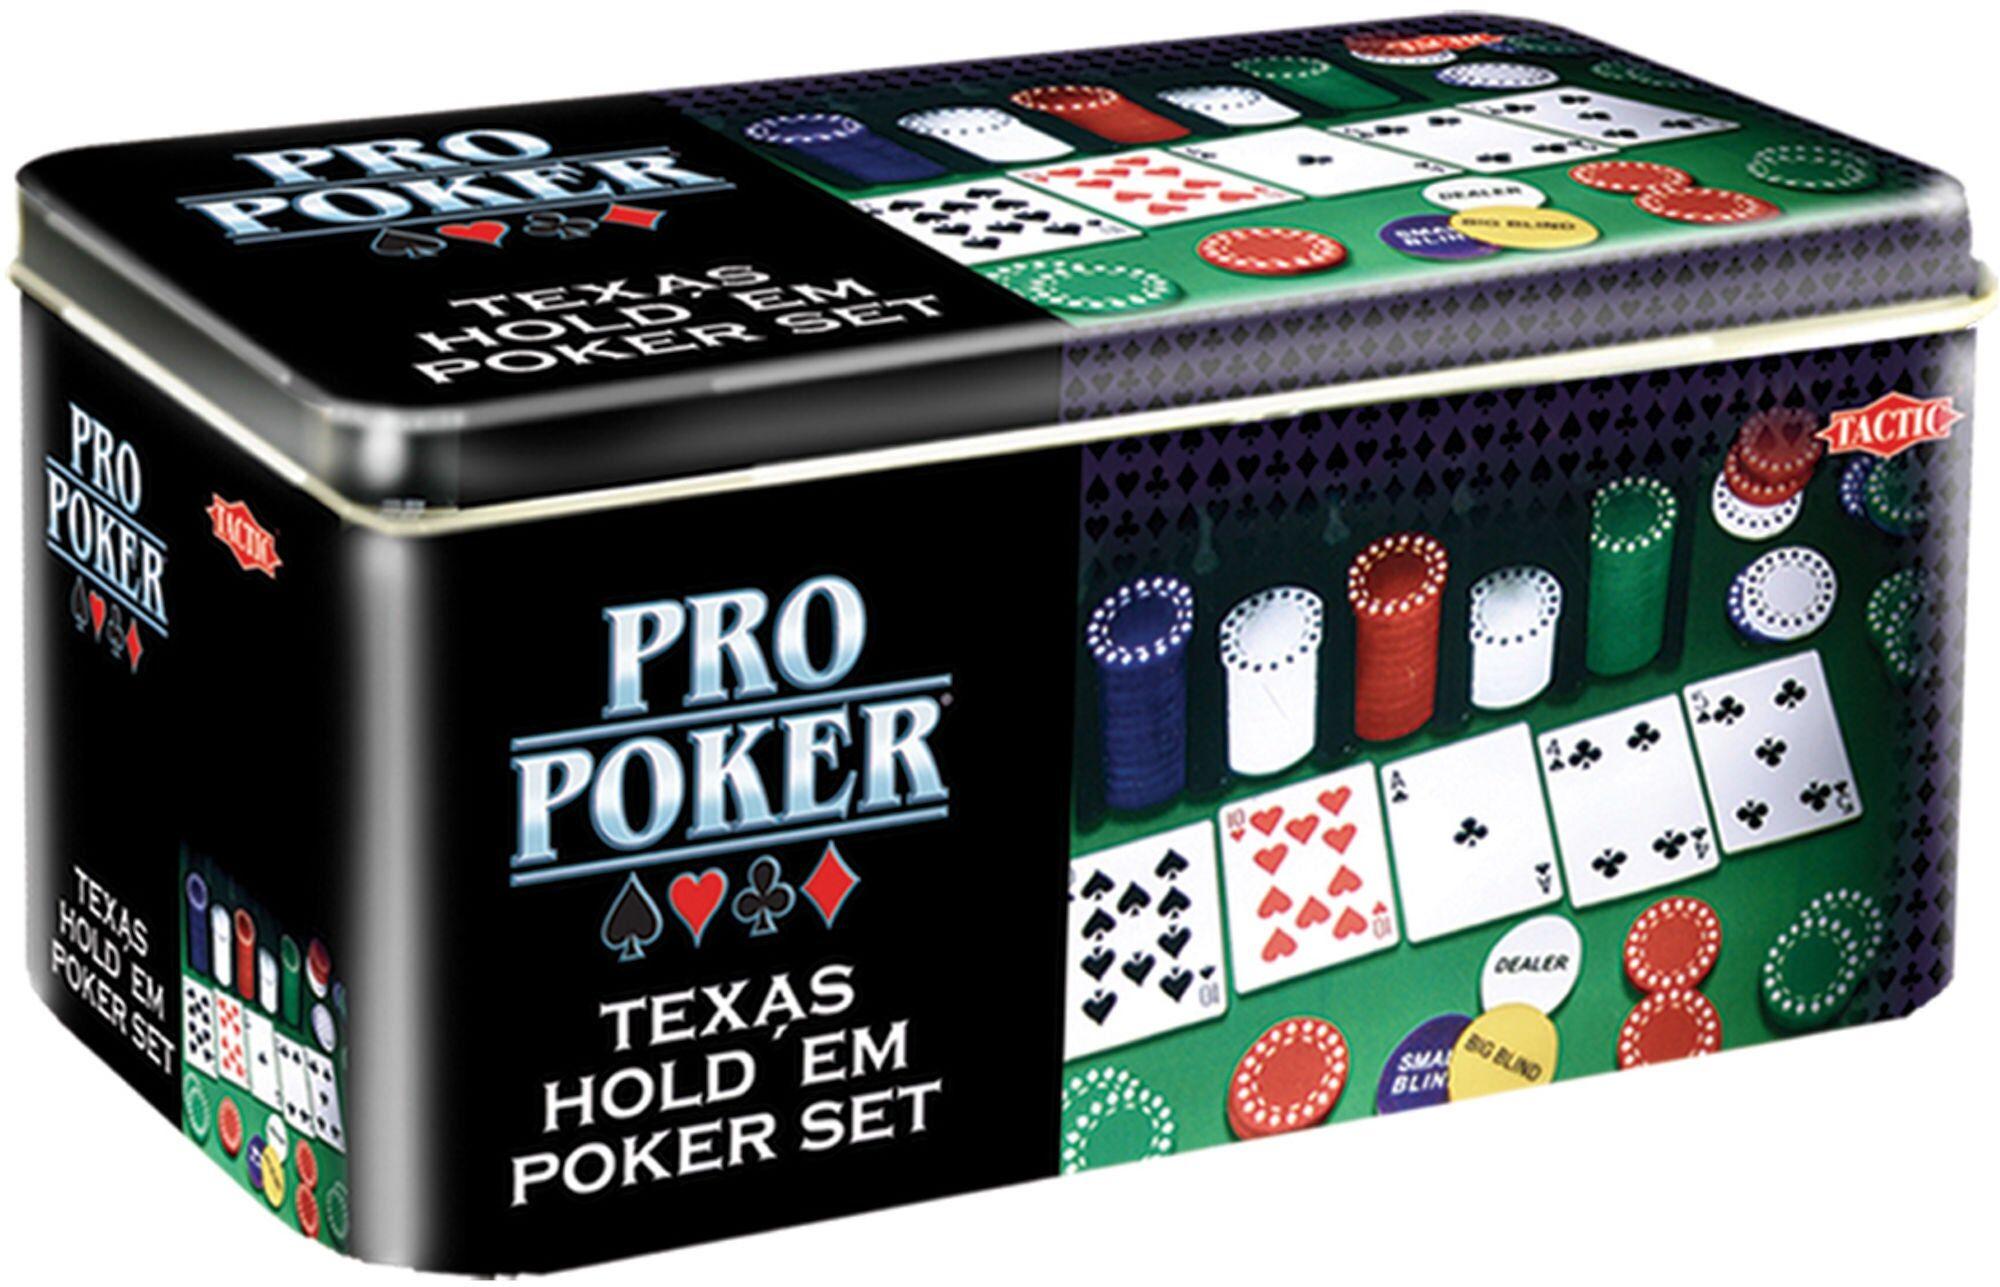 Tactic Pro Poker Texas Hold'em